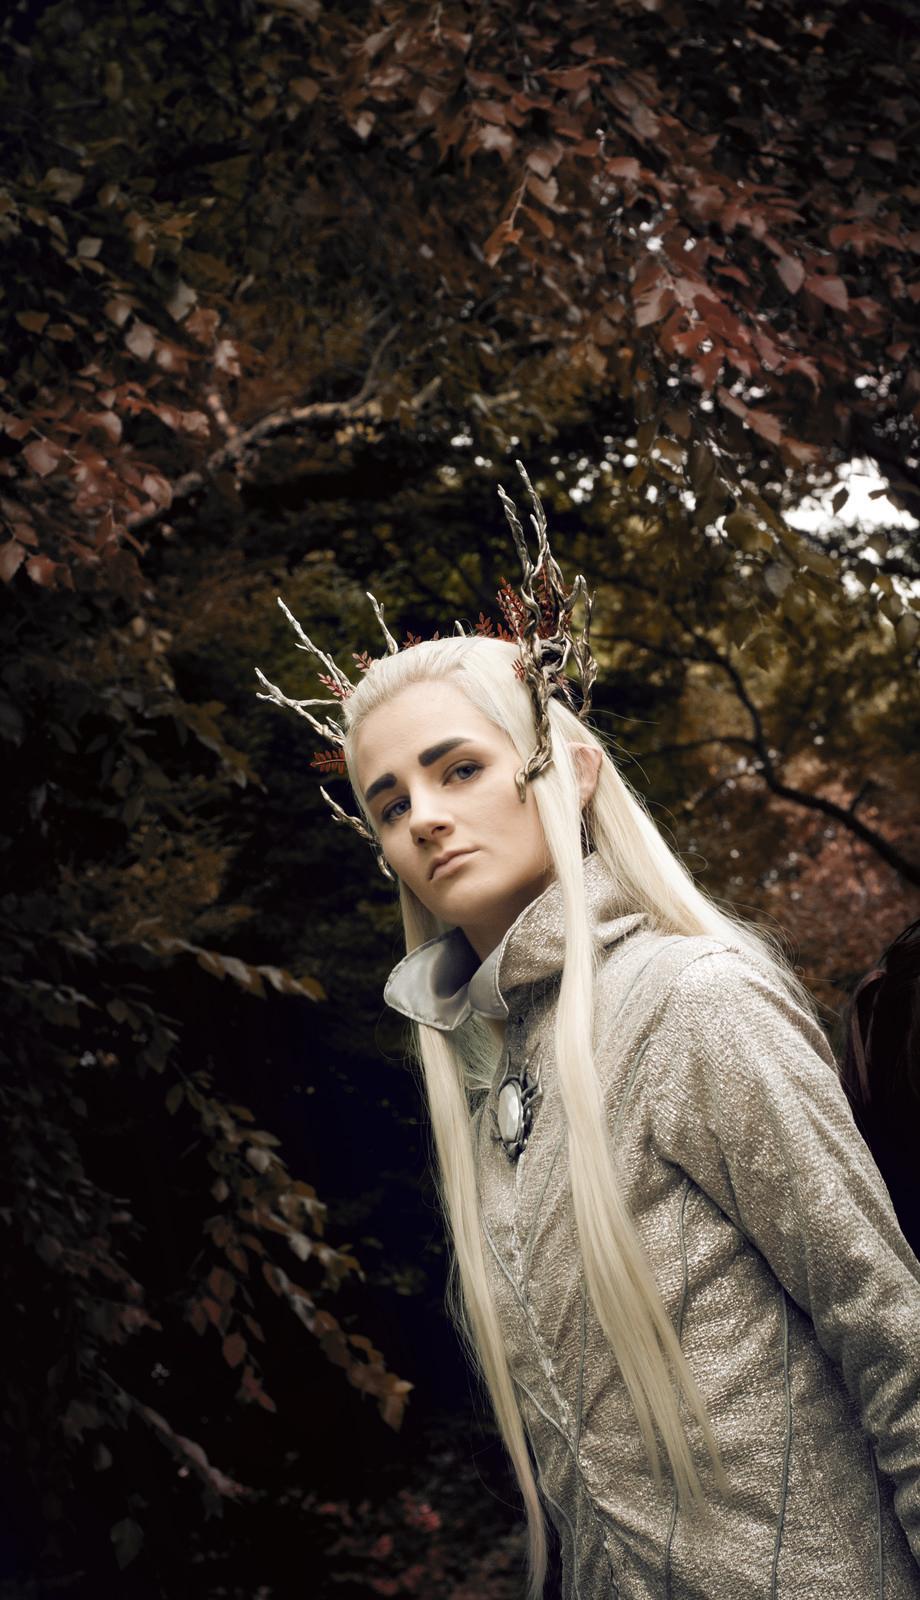 The Hobbit - Oropherion